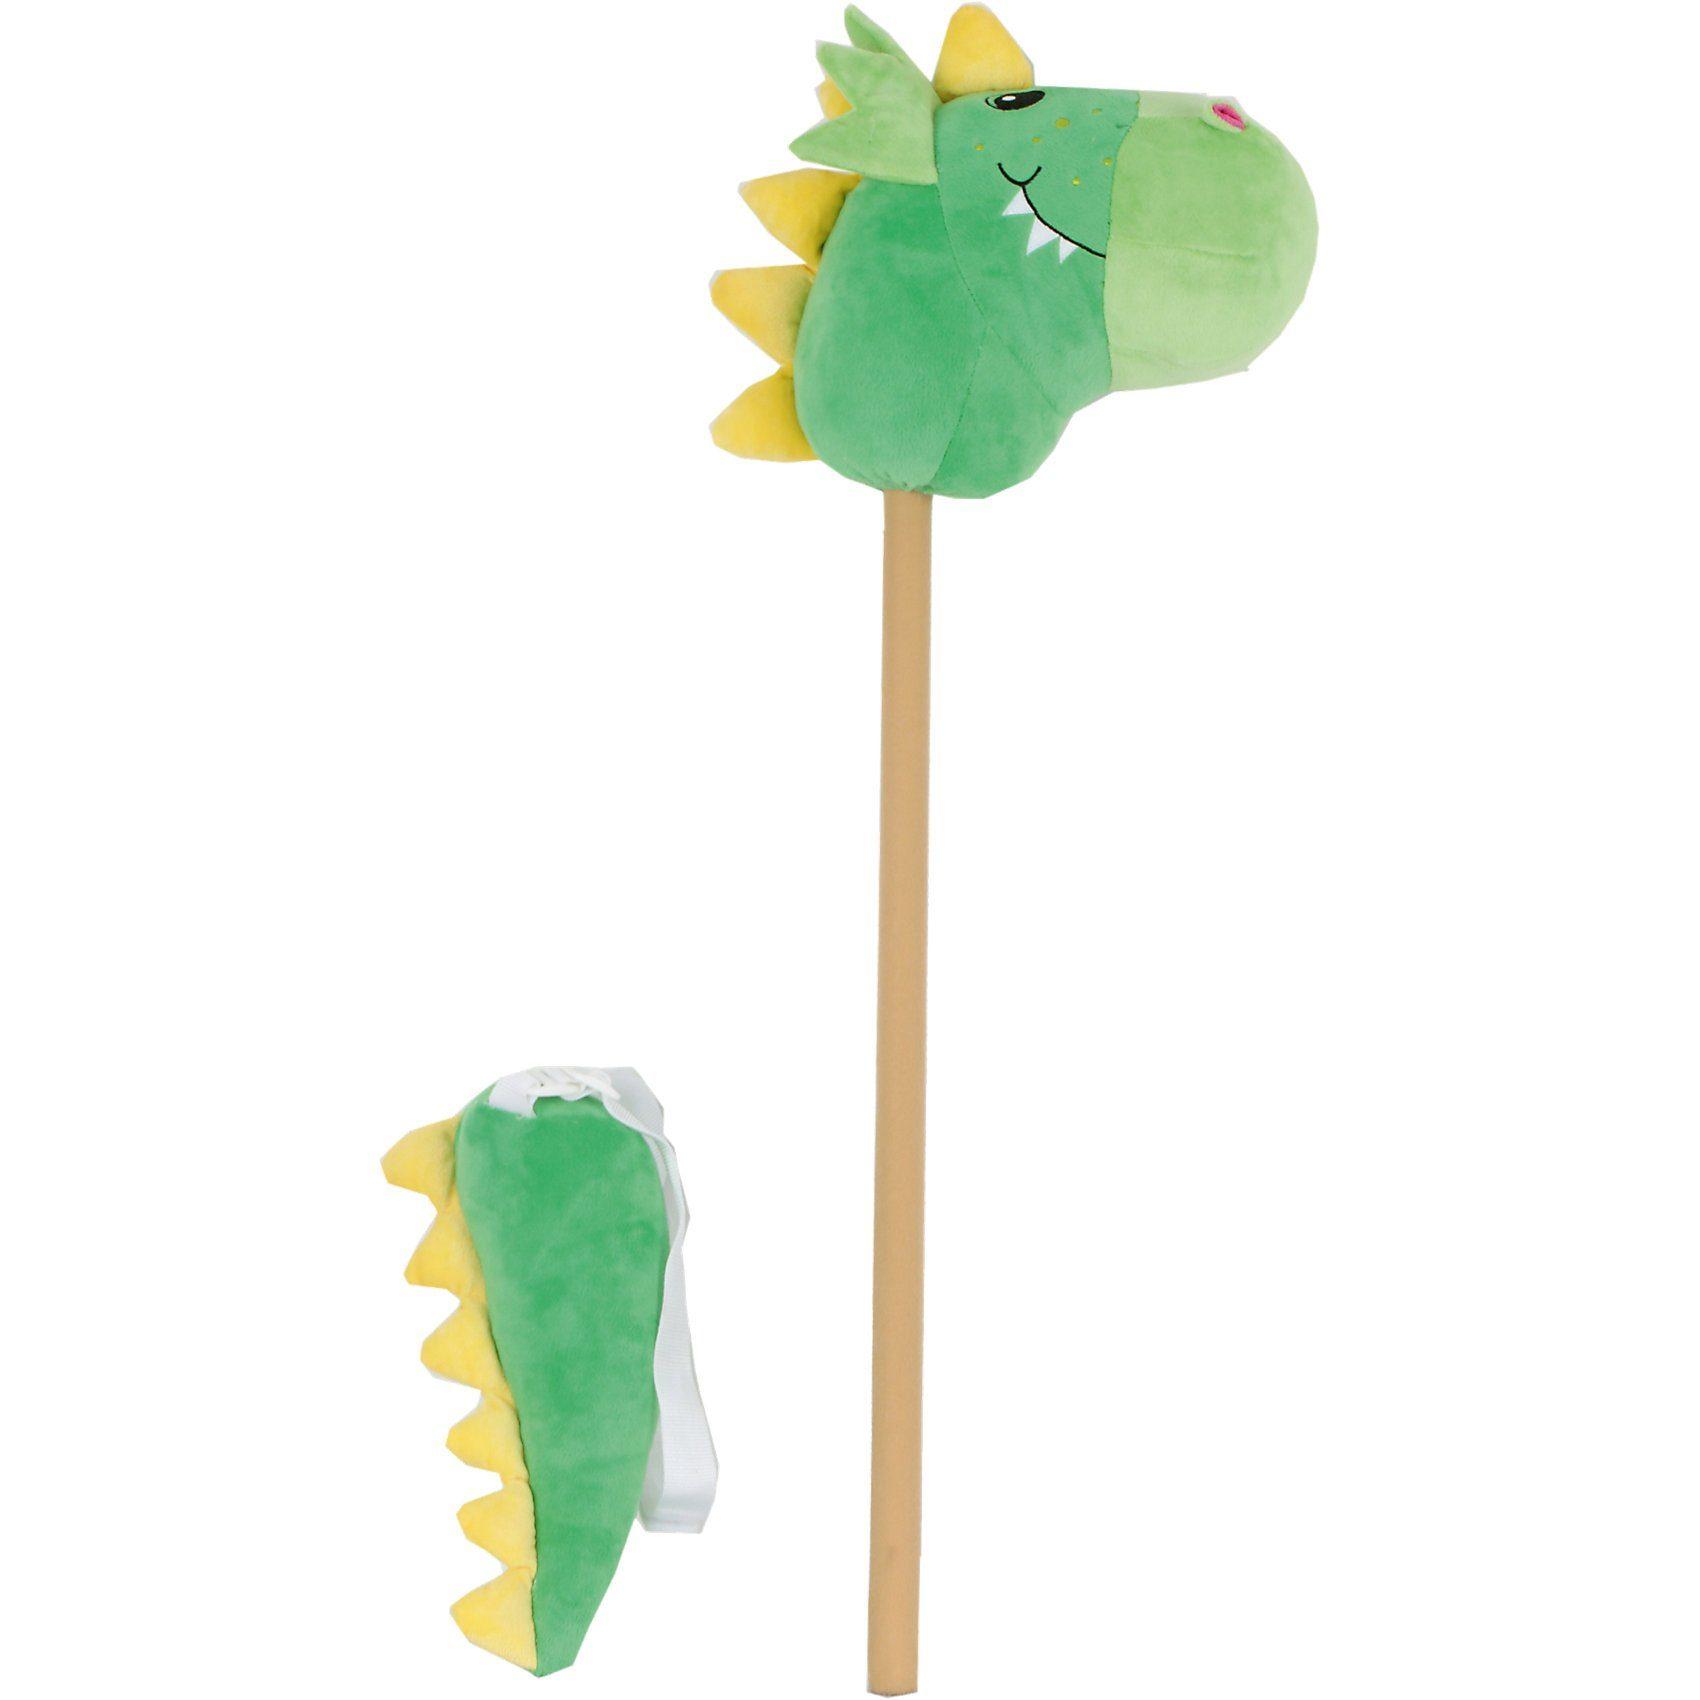 Sweety-Toys Sweety Toys SET Steckenpferd Dinosaurier - GRÜN